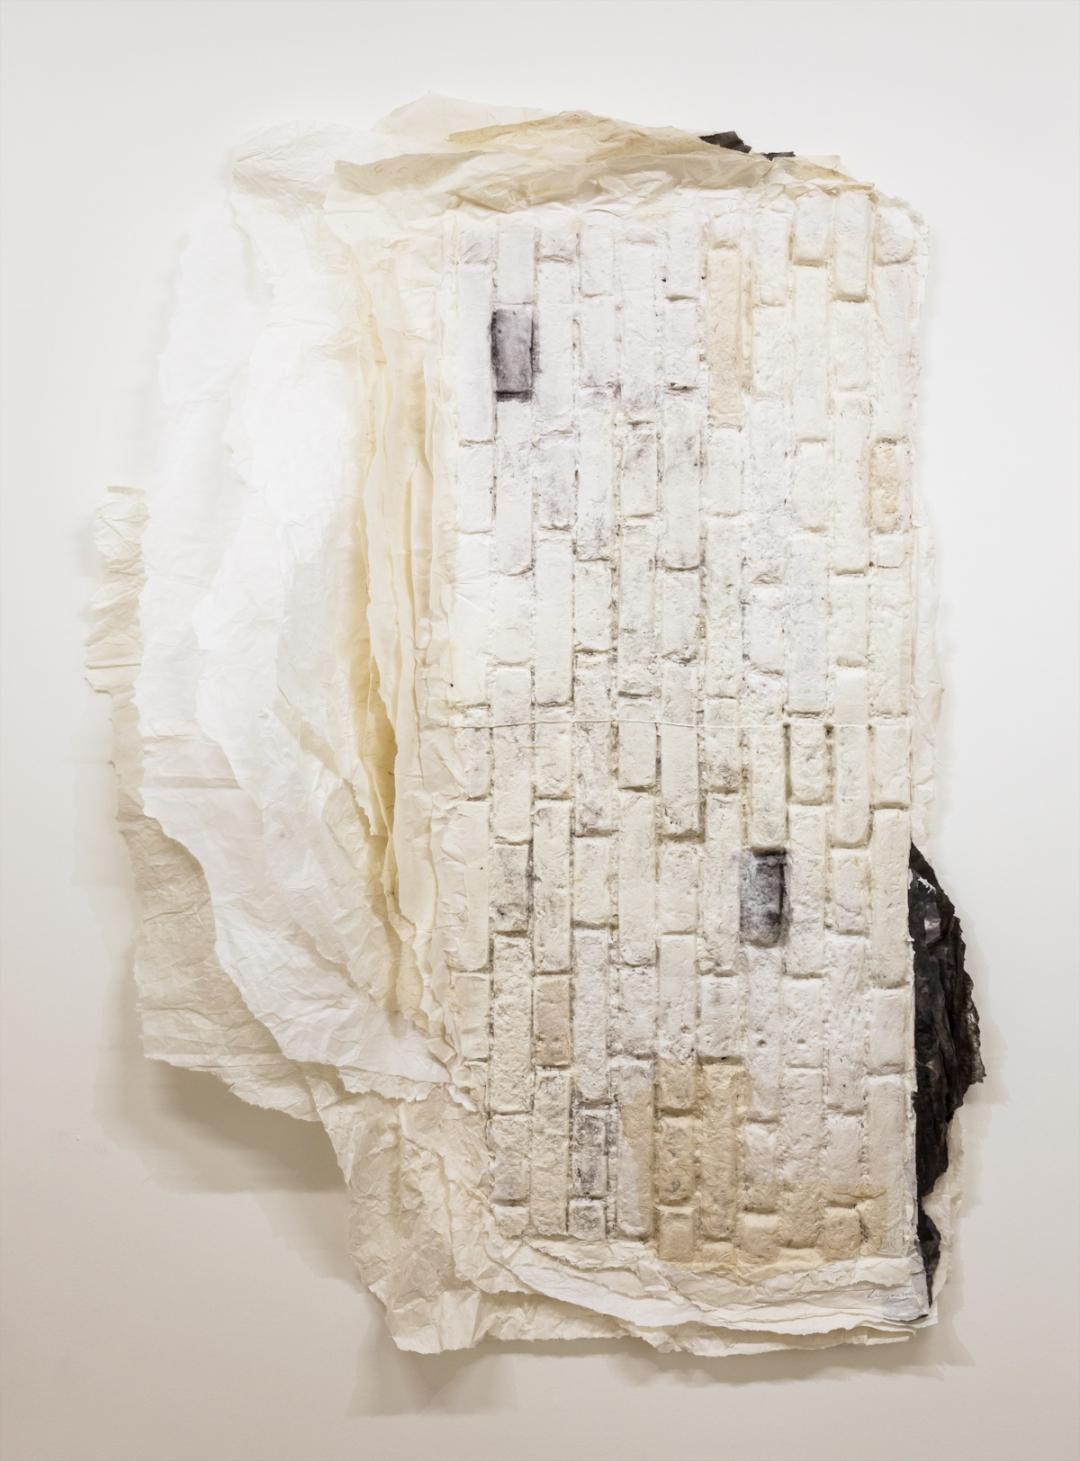 Lin Yan, <i>Monument 8</i>, 2008, Xuan paper, ink, 103 x 50 x 8 in. (262 x 127 x 21 cm)